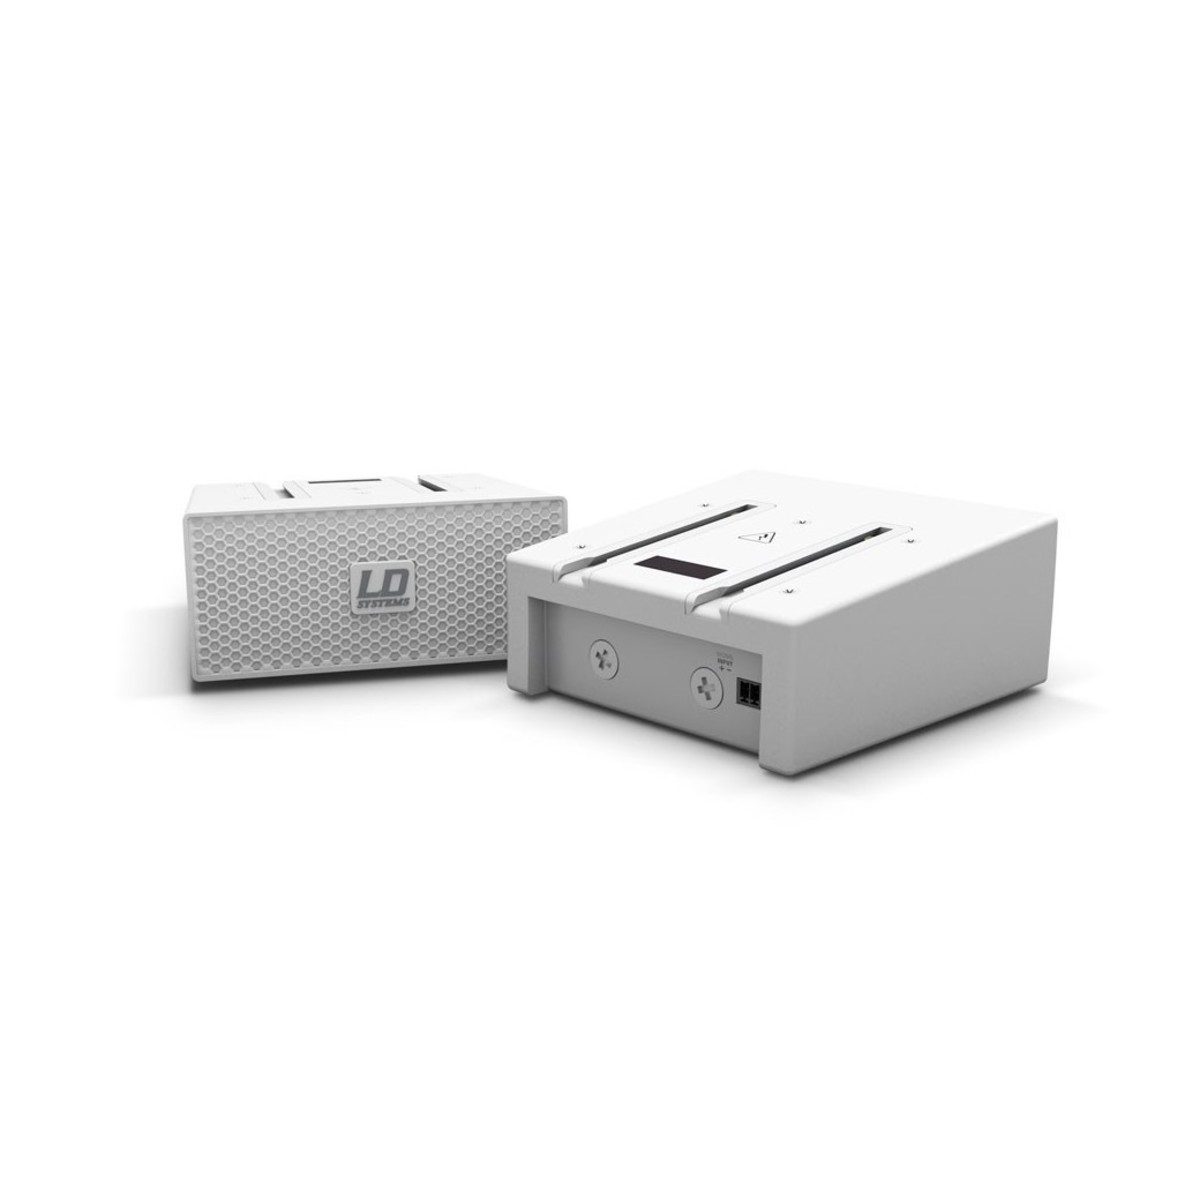 LD Systems CURV500 SLAWT Variable Voltage Smartlink Adapter White